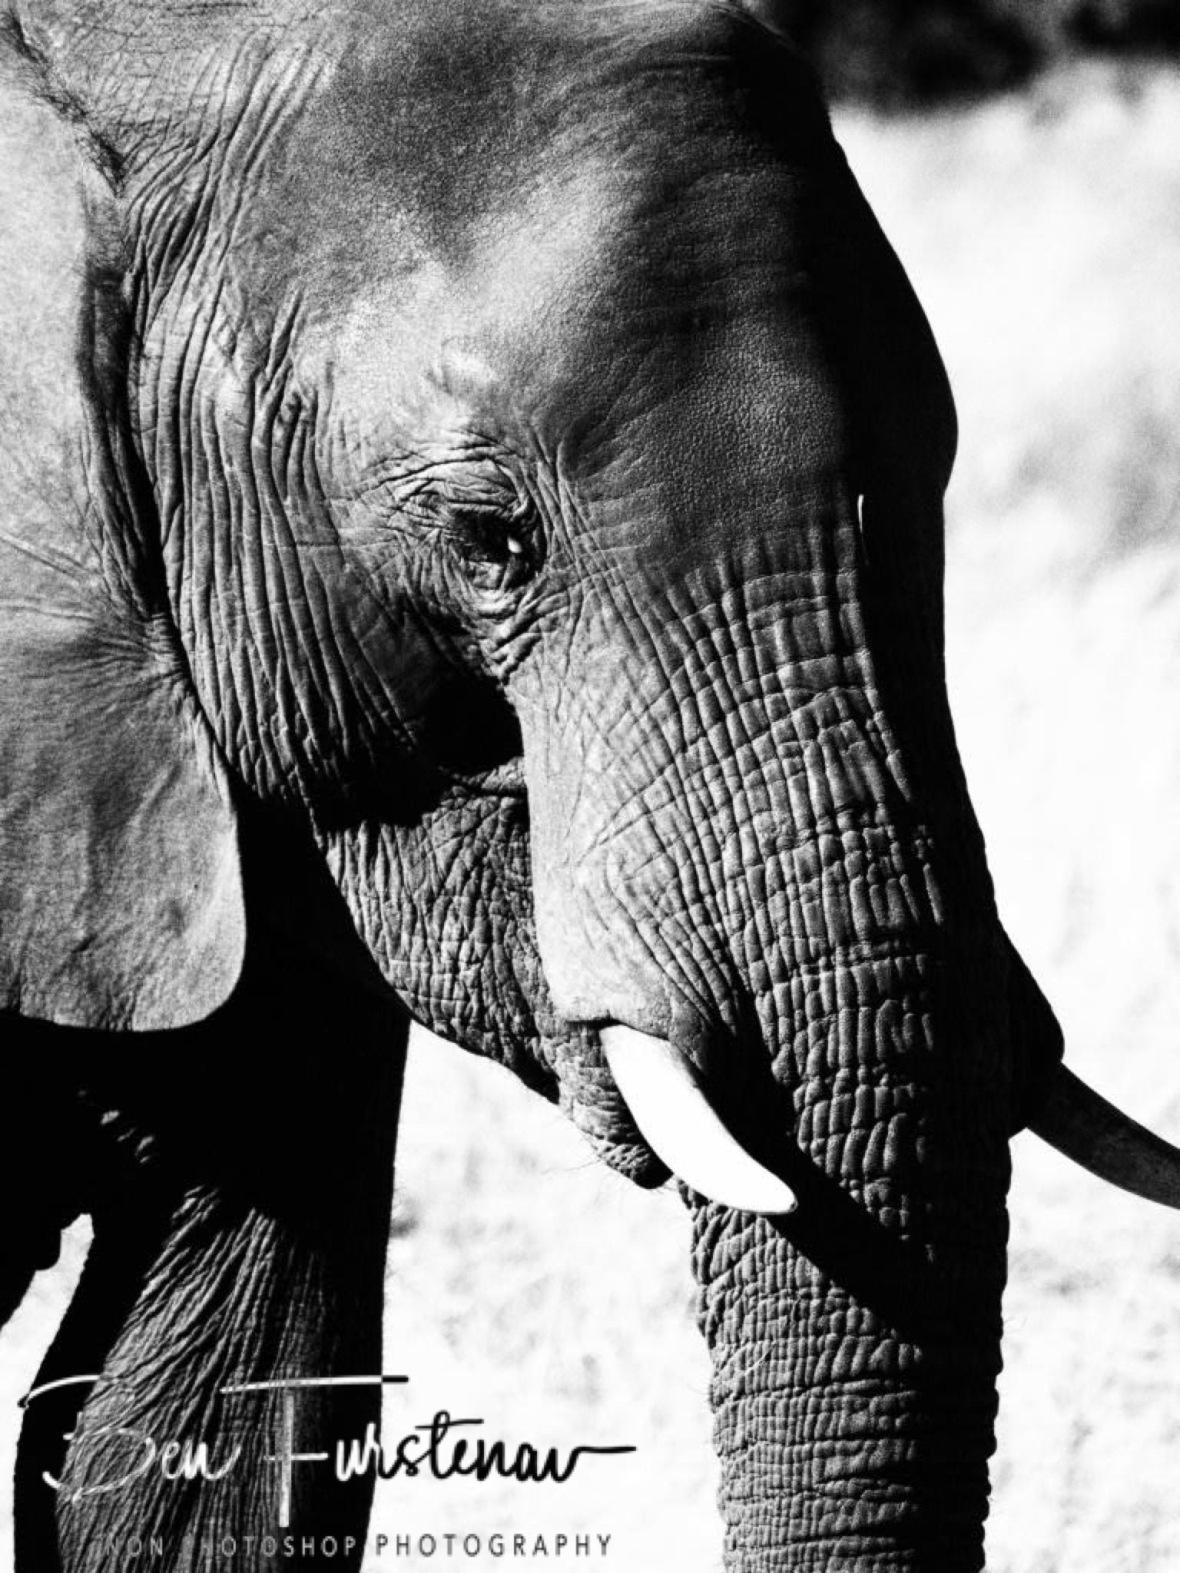 Detailed complexion, Chobe National Park, Botswana